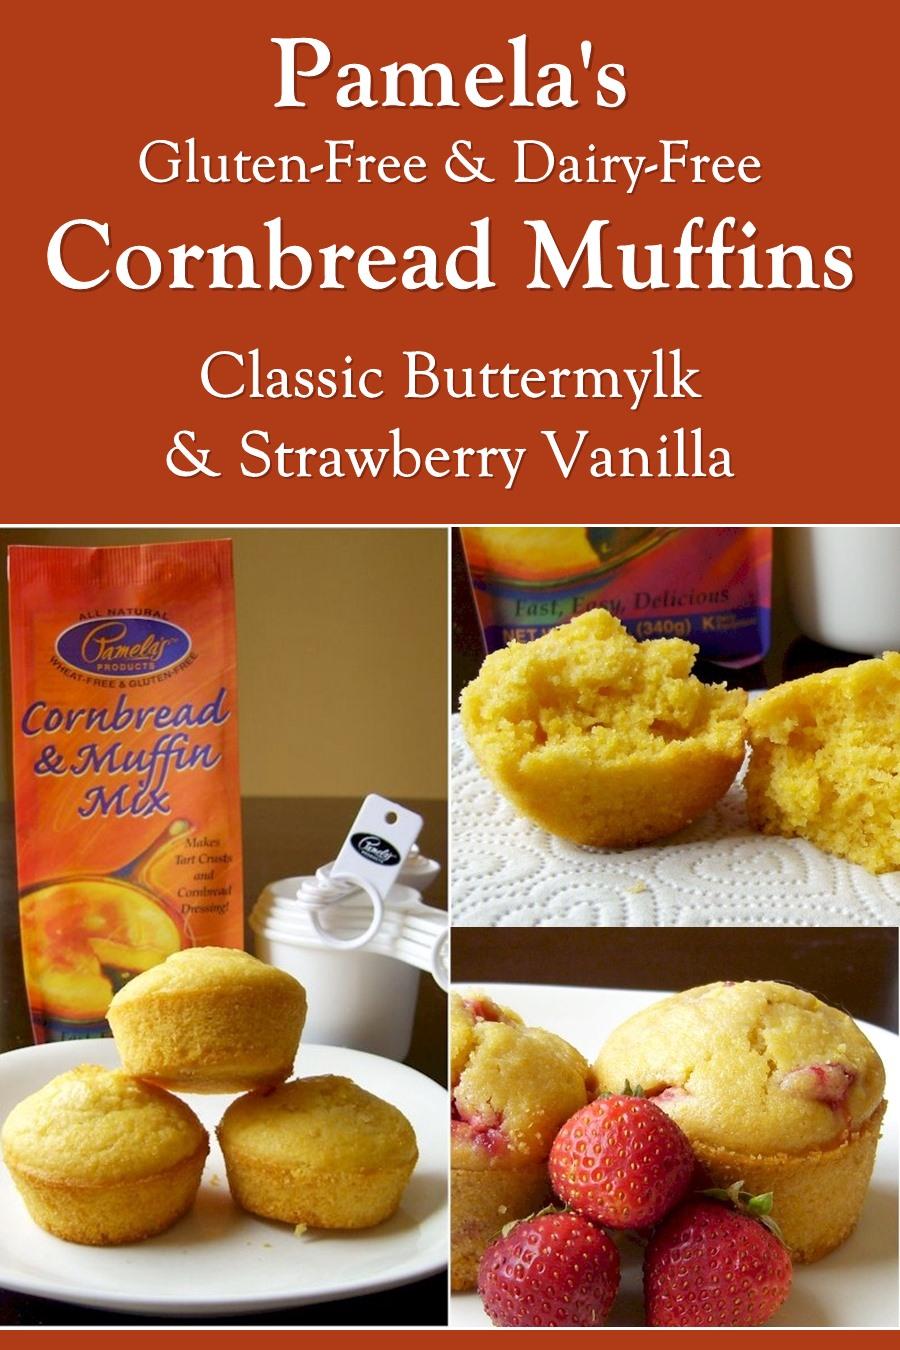 Pamela's Cornbread Muffins: Dairy-Free Buttermilk & Strawberry Vanilla Recipe Variations - shortcut gluten-free recipes